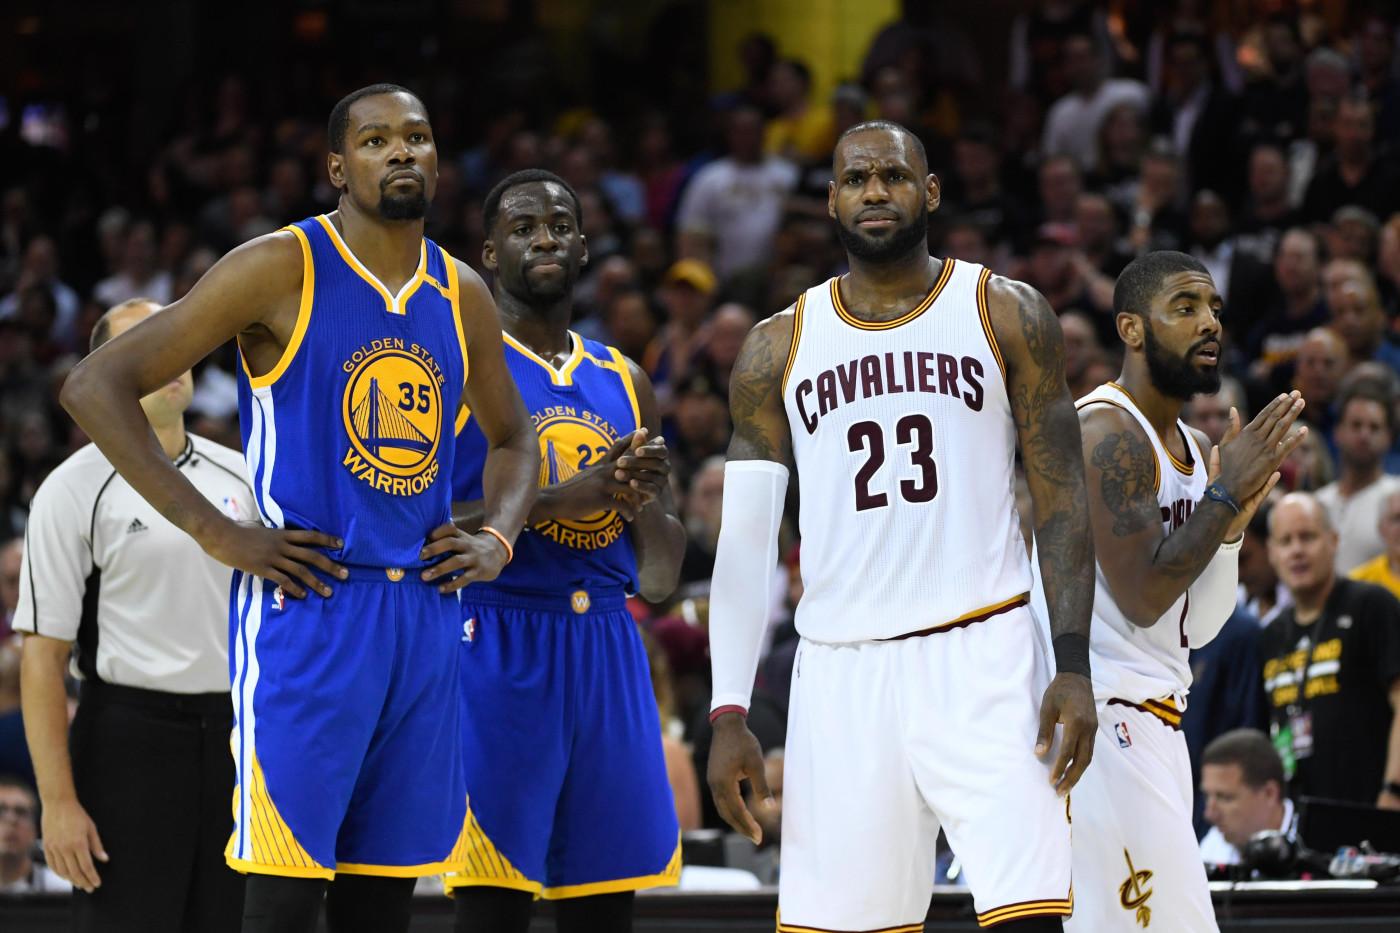 Kevin Durant LeBron James Game 4 NBA Finals 2017